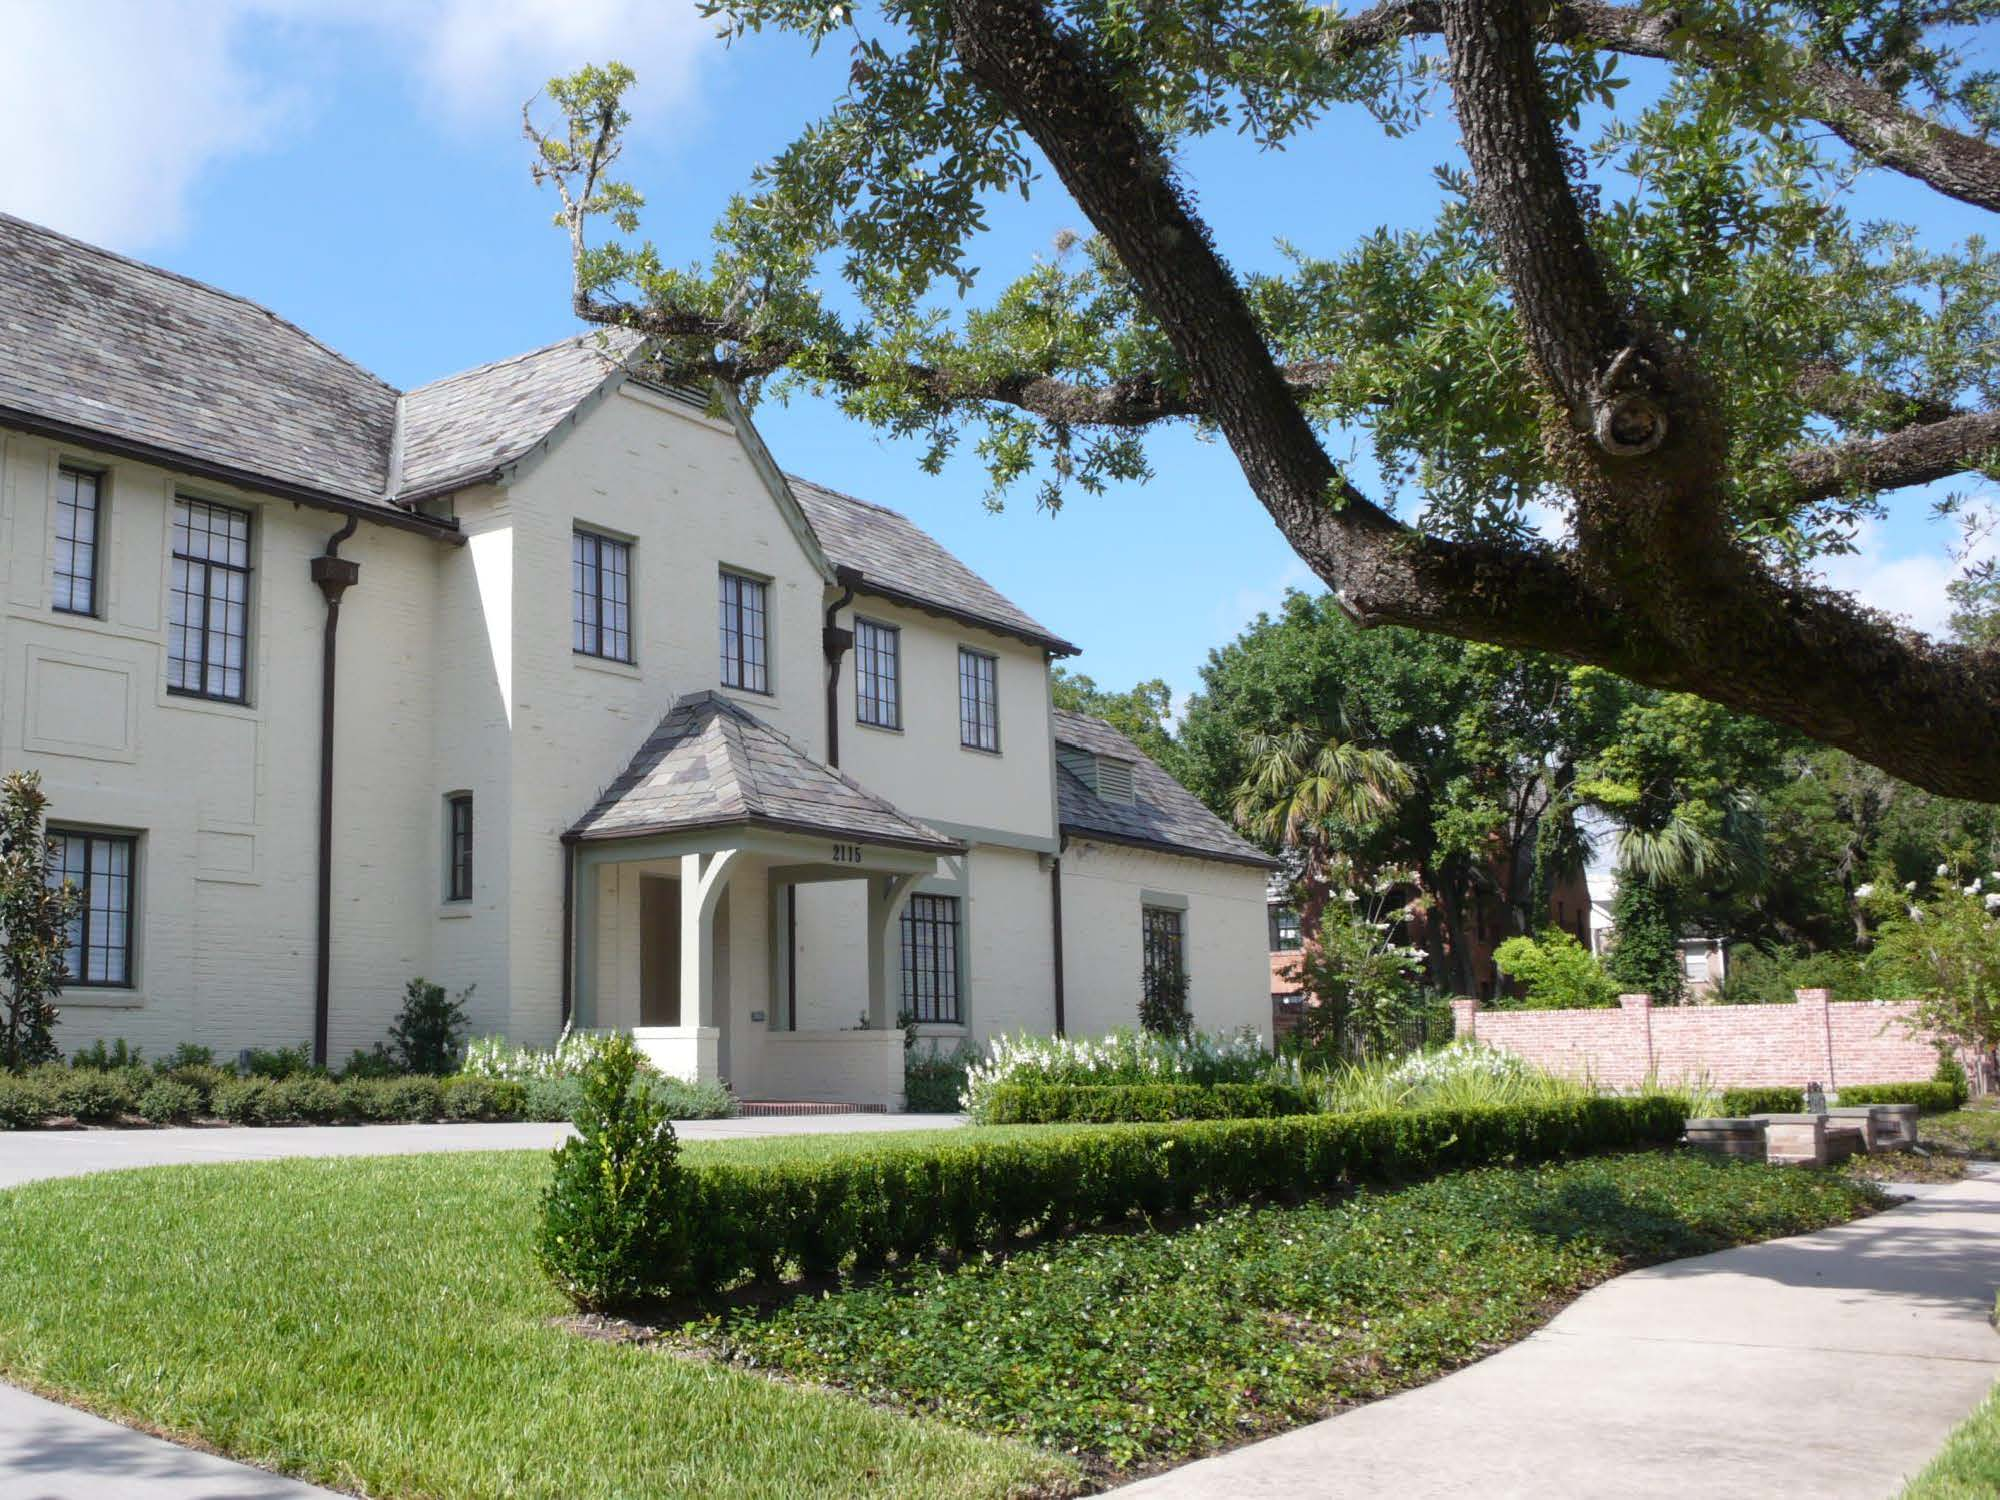 Preservation Houston's Good Brick Award